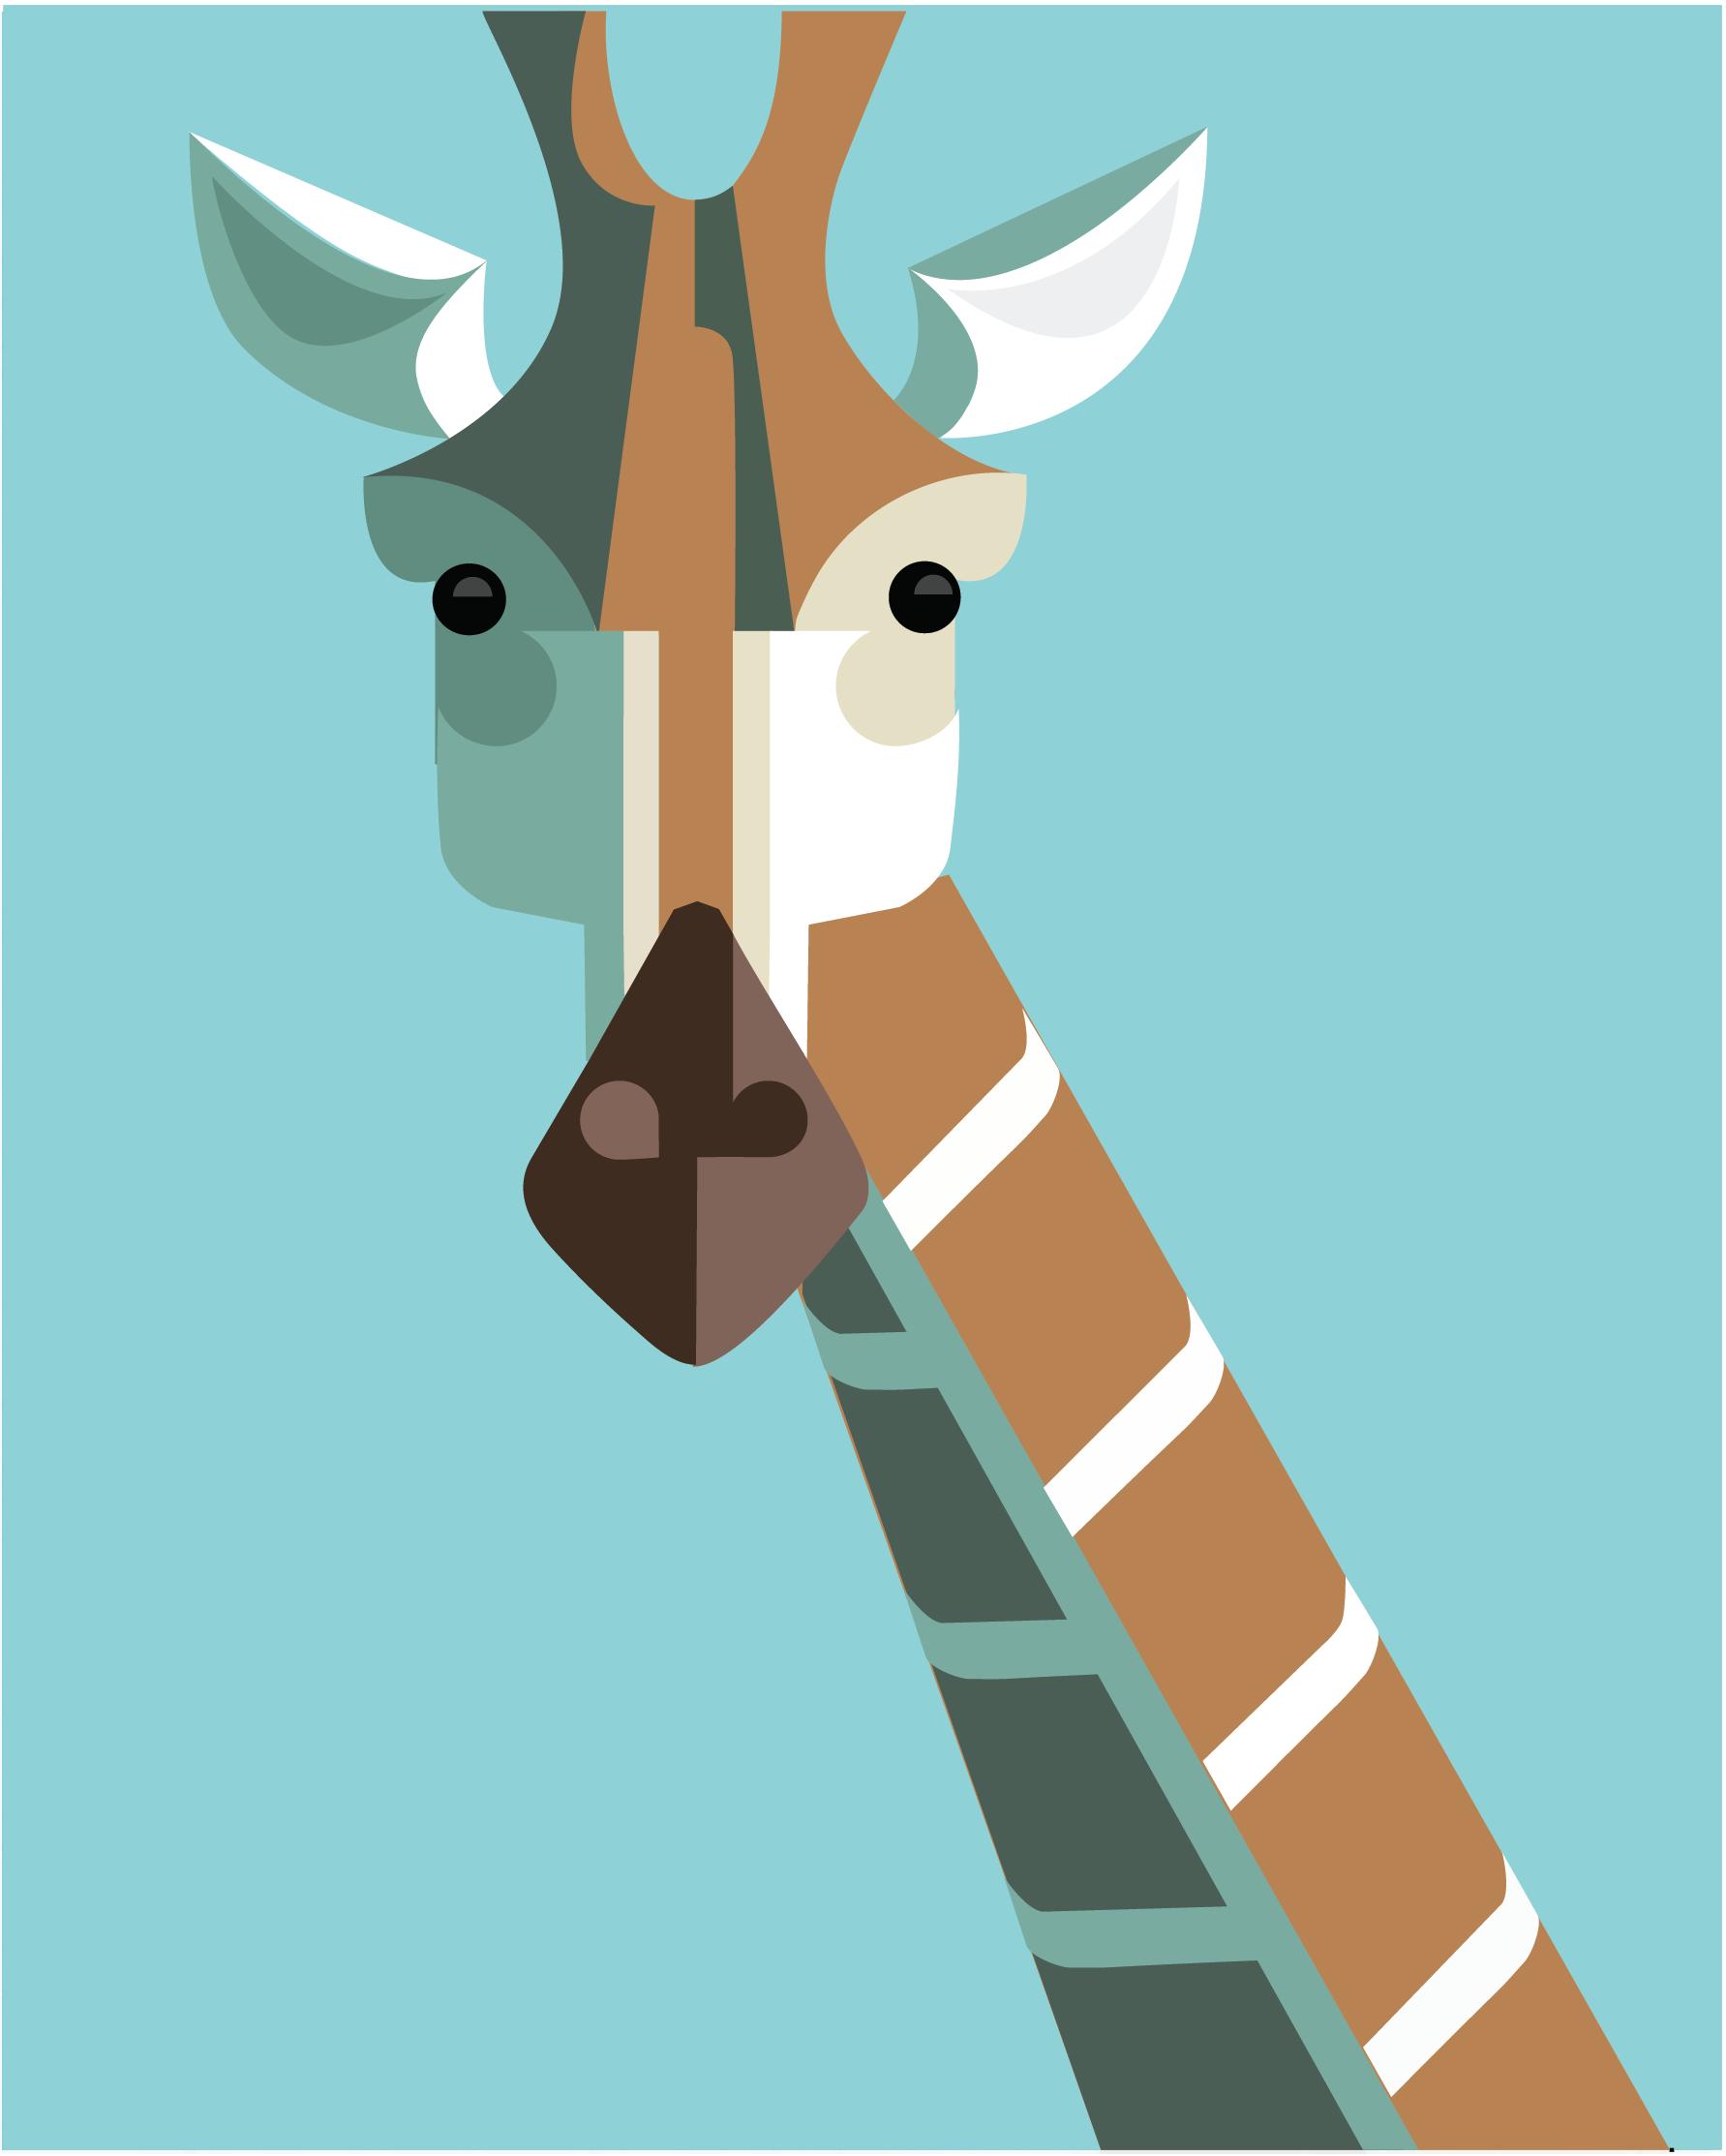 Giraffua - image 4 - student project